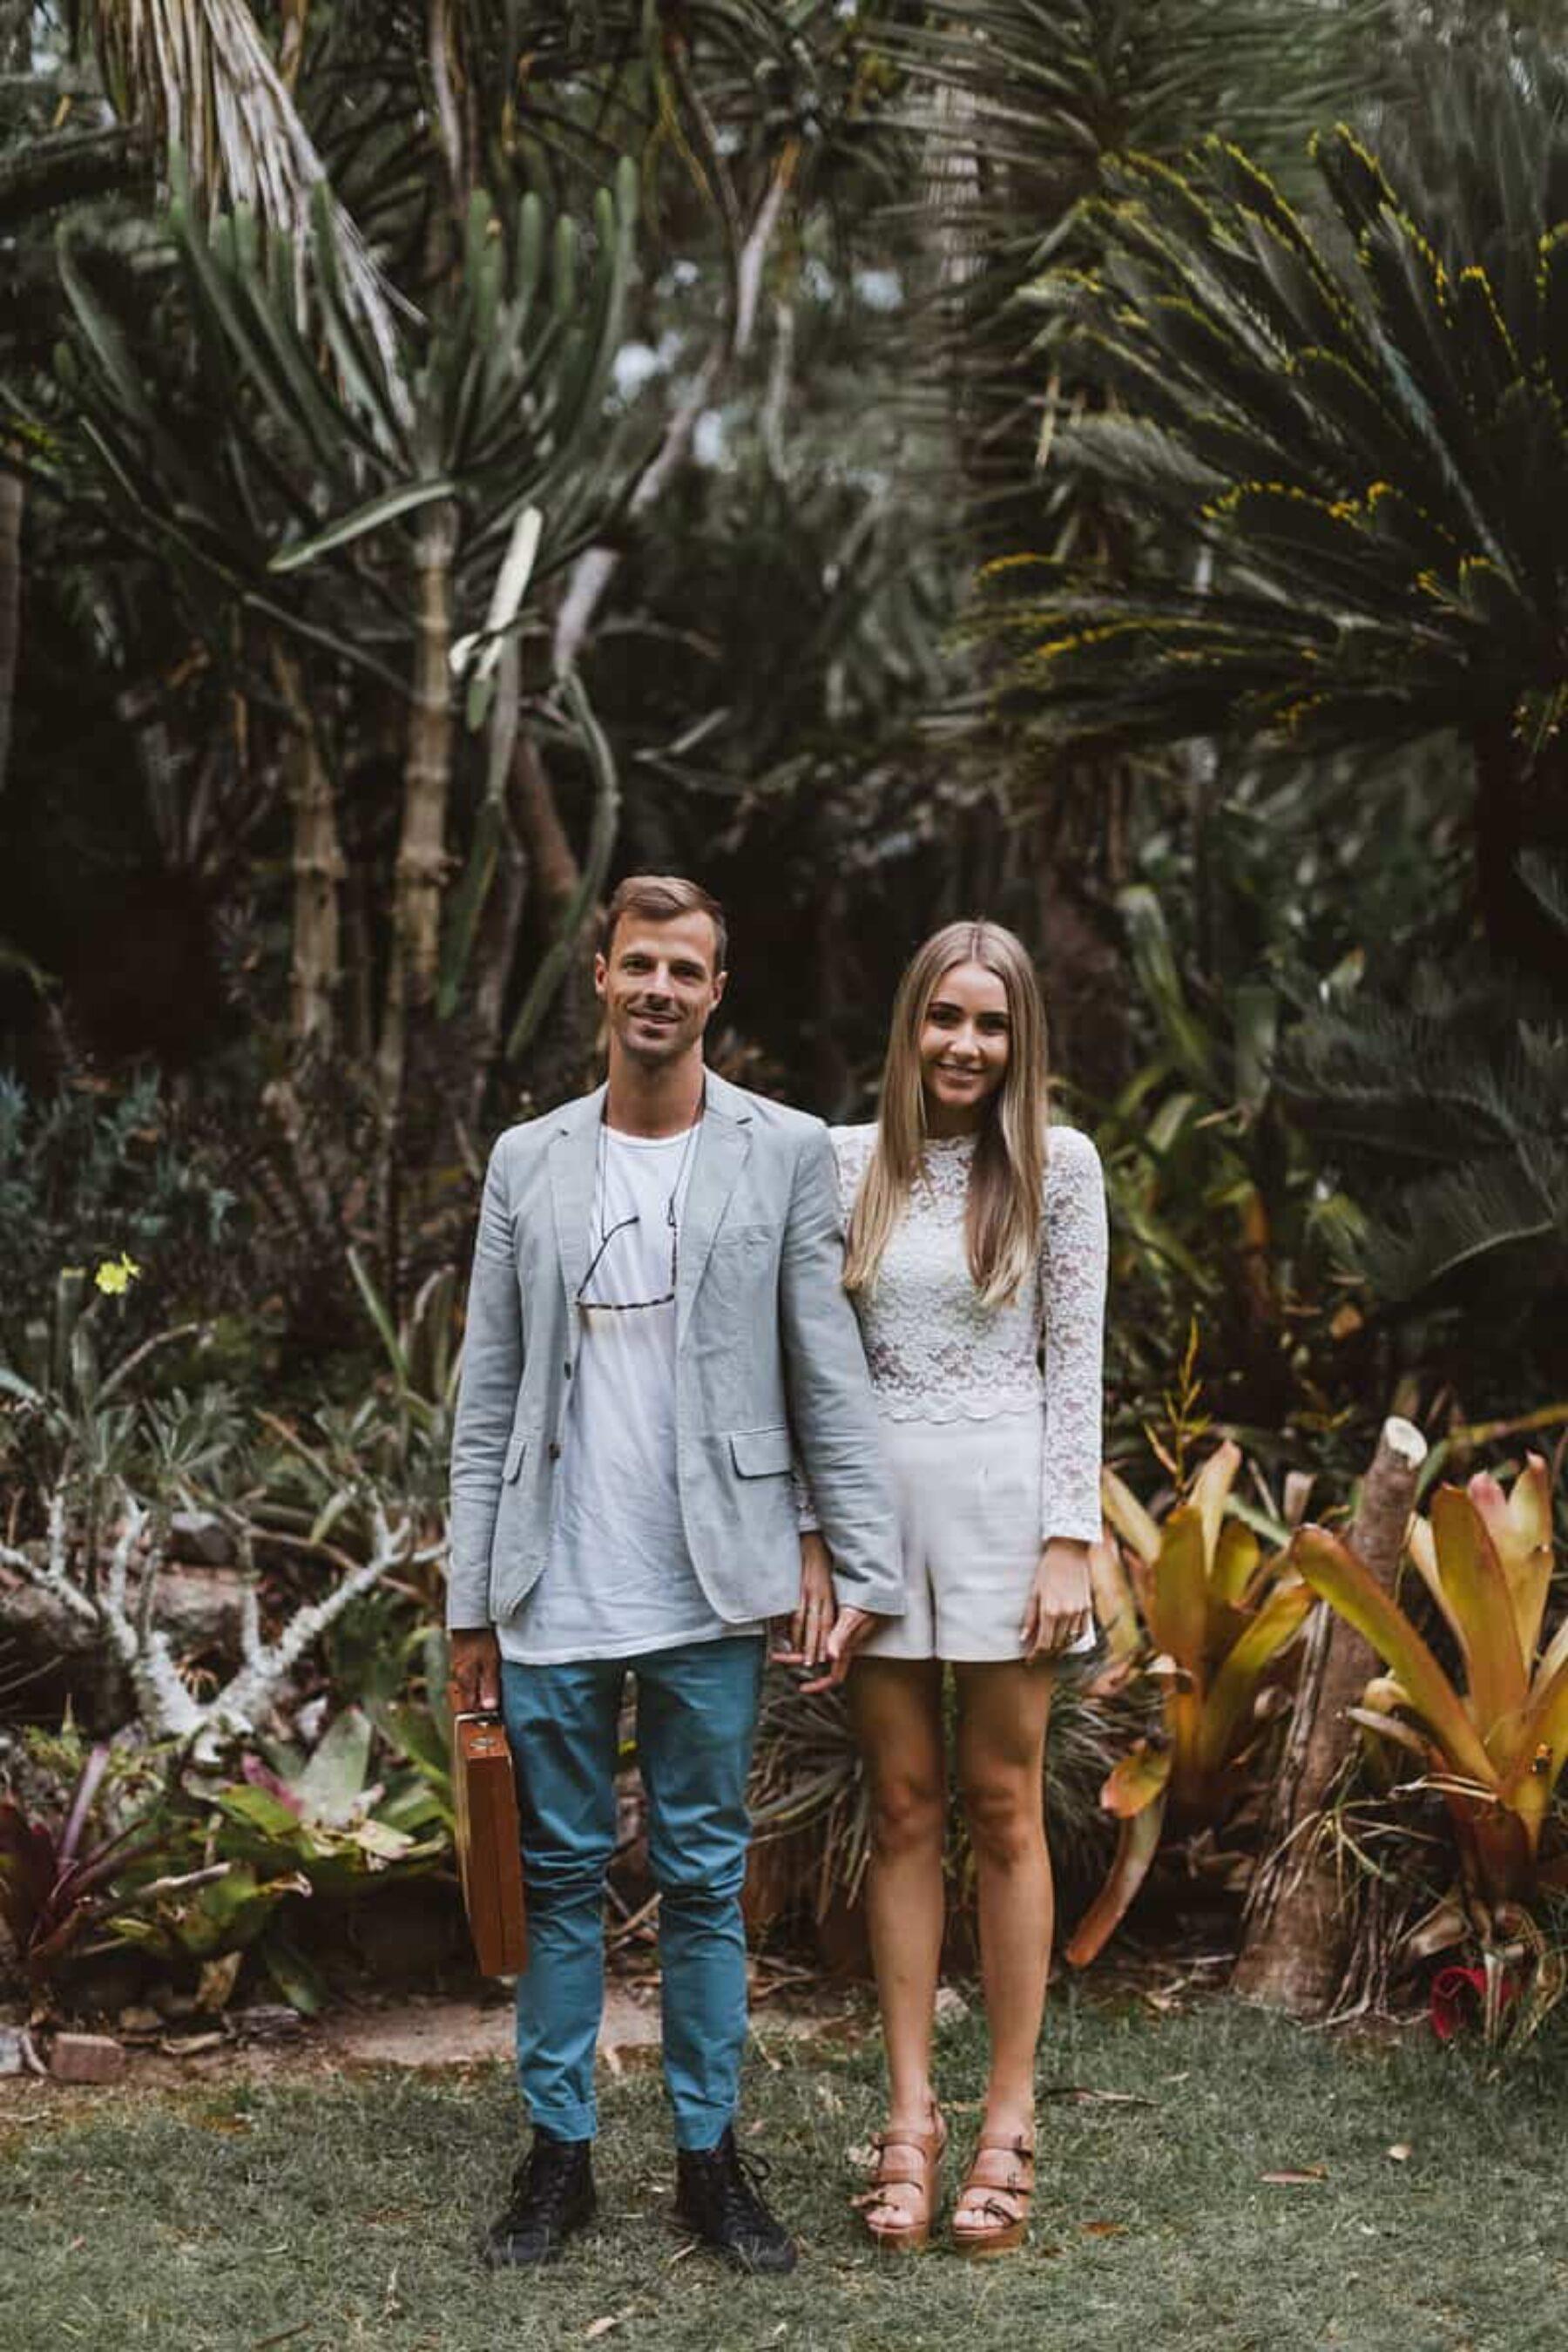 Cactus farm engagement shoot / photography by Janneke Storm